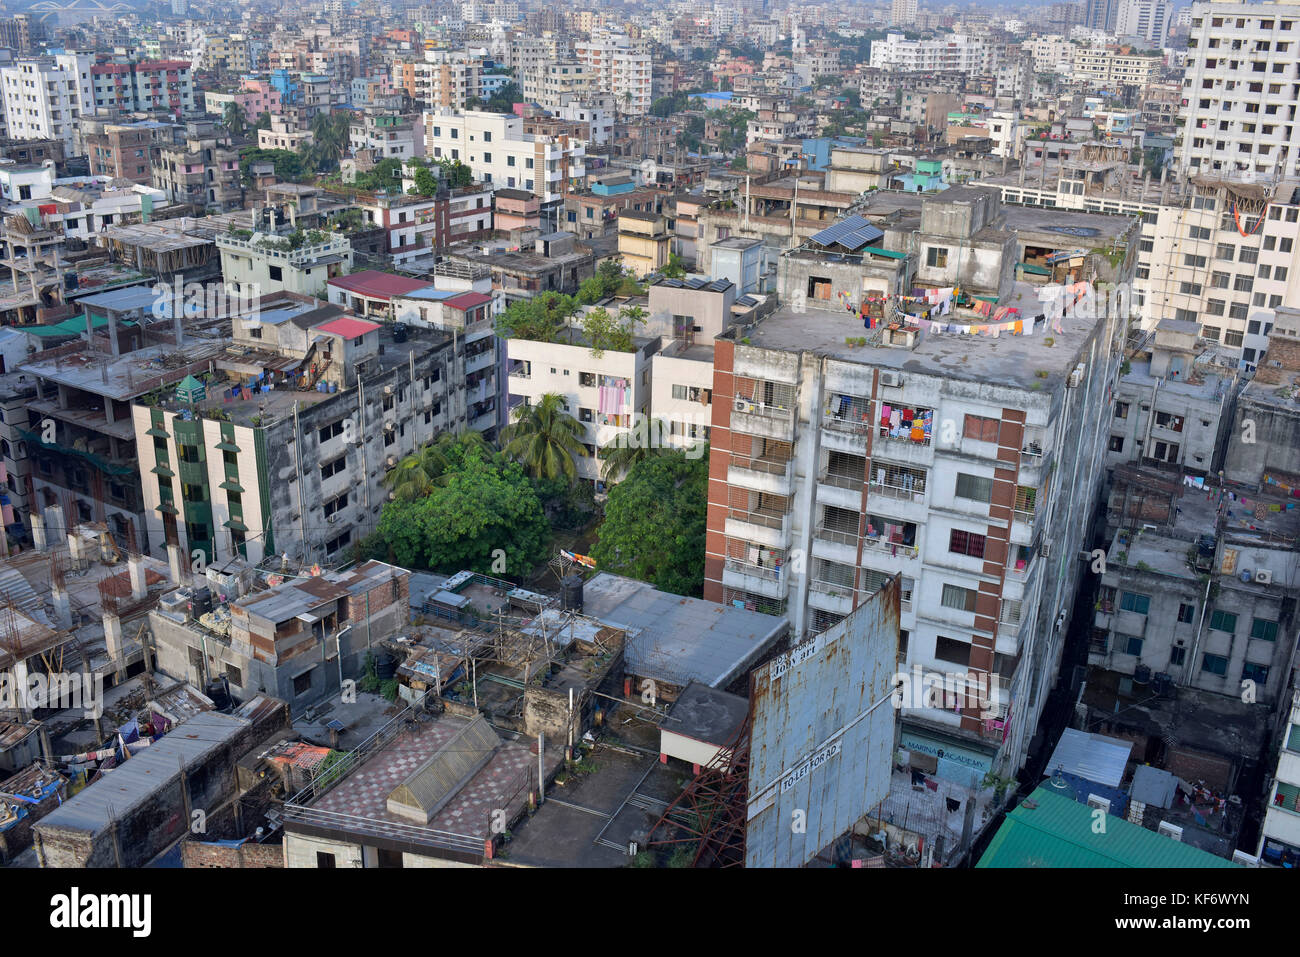 Dhaka, Bangladesh. 26th Oct, 2017.  Birdseye view of the Dhaka Metropolitan city. Dhaka, a city of over 15 million - Stock Image